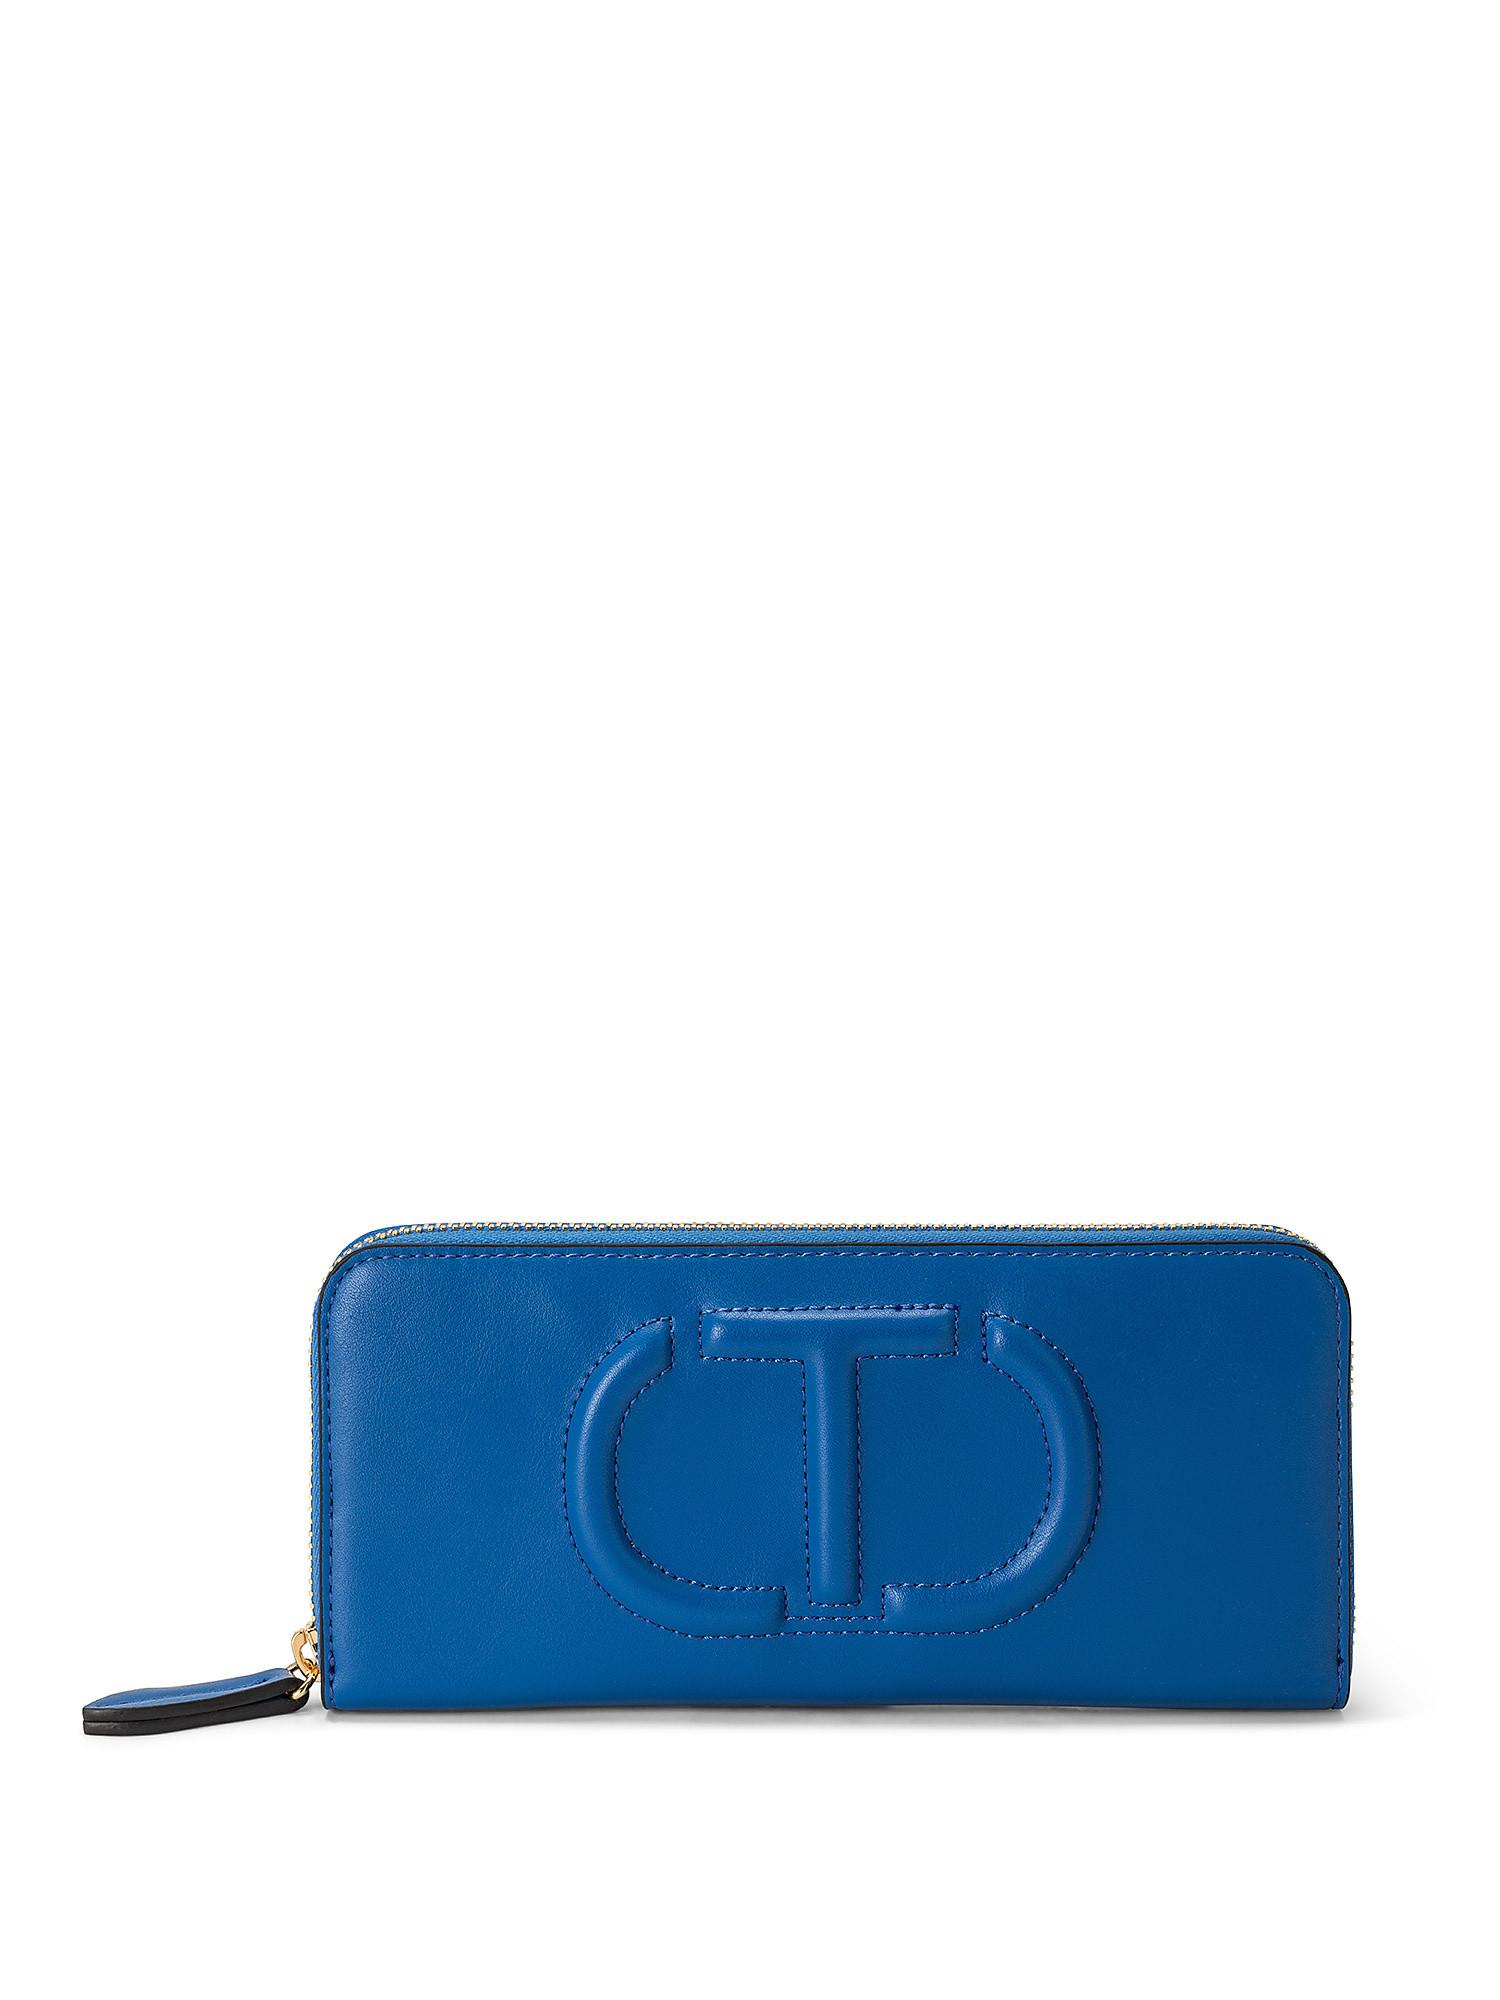 Portafoglio zip around grande t trapuntata, Blu, large image number 0